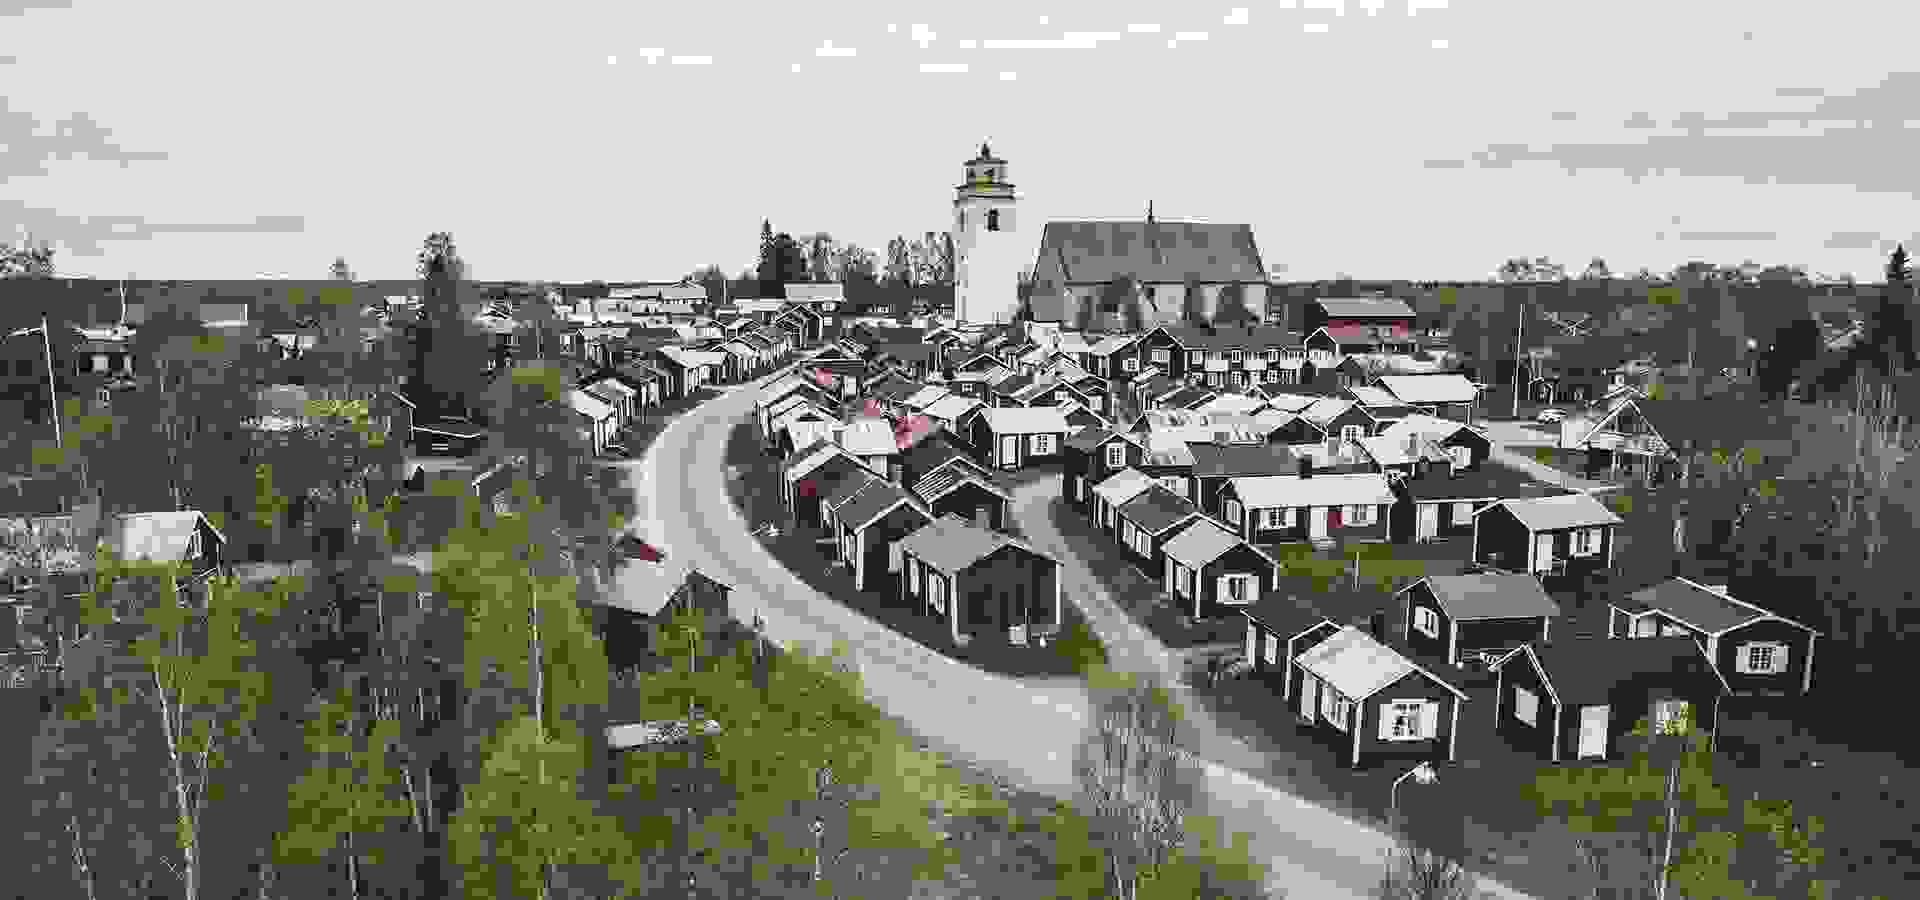 gammelstad kyrkstad, kyrka, ted logart, 1920 x 1080